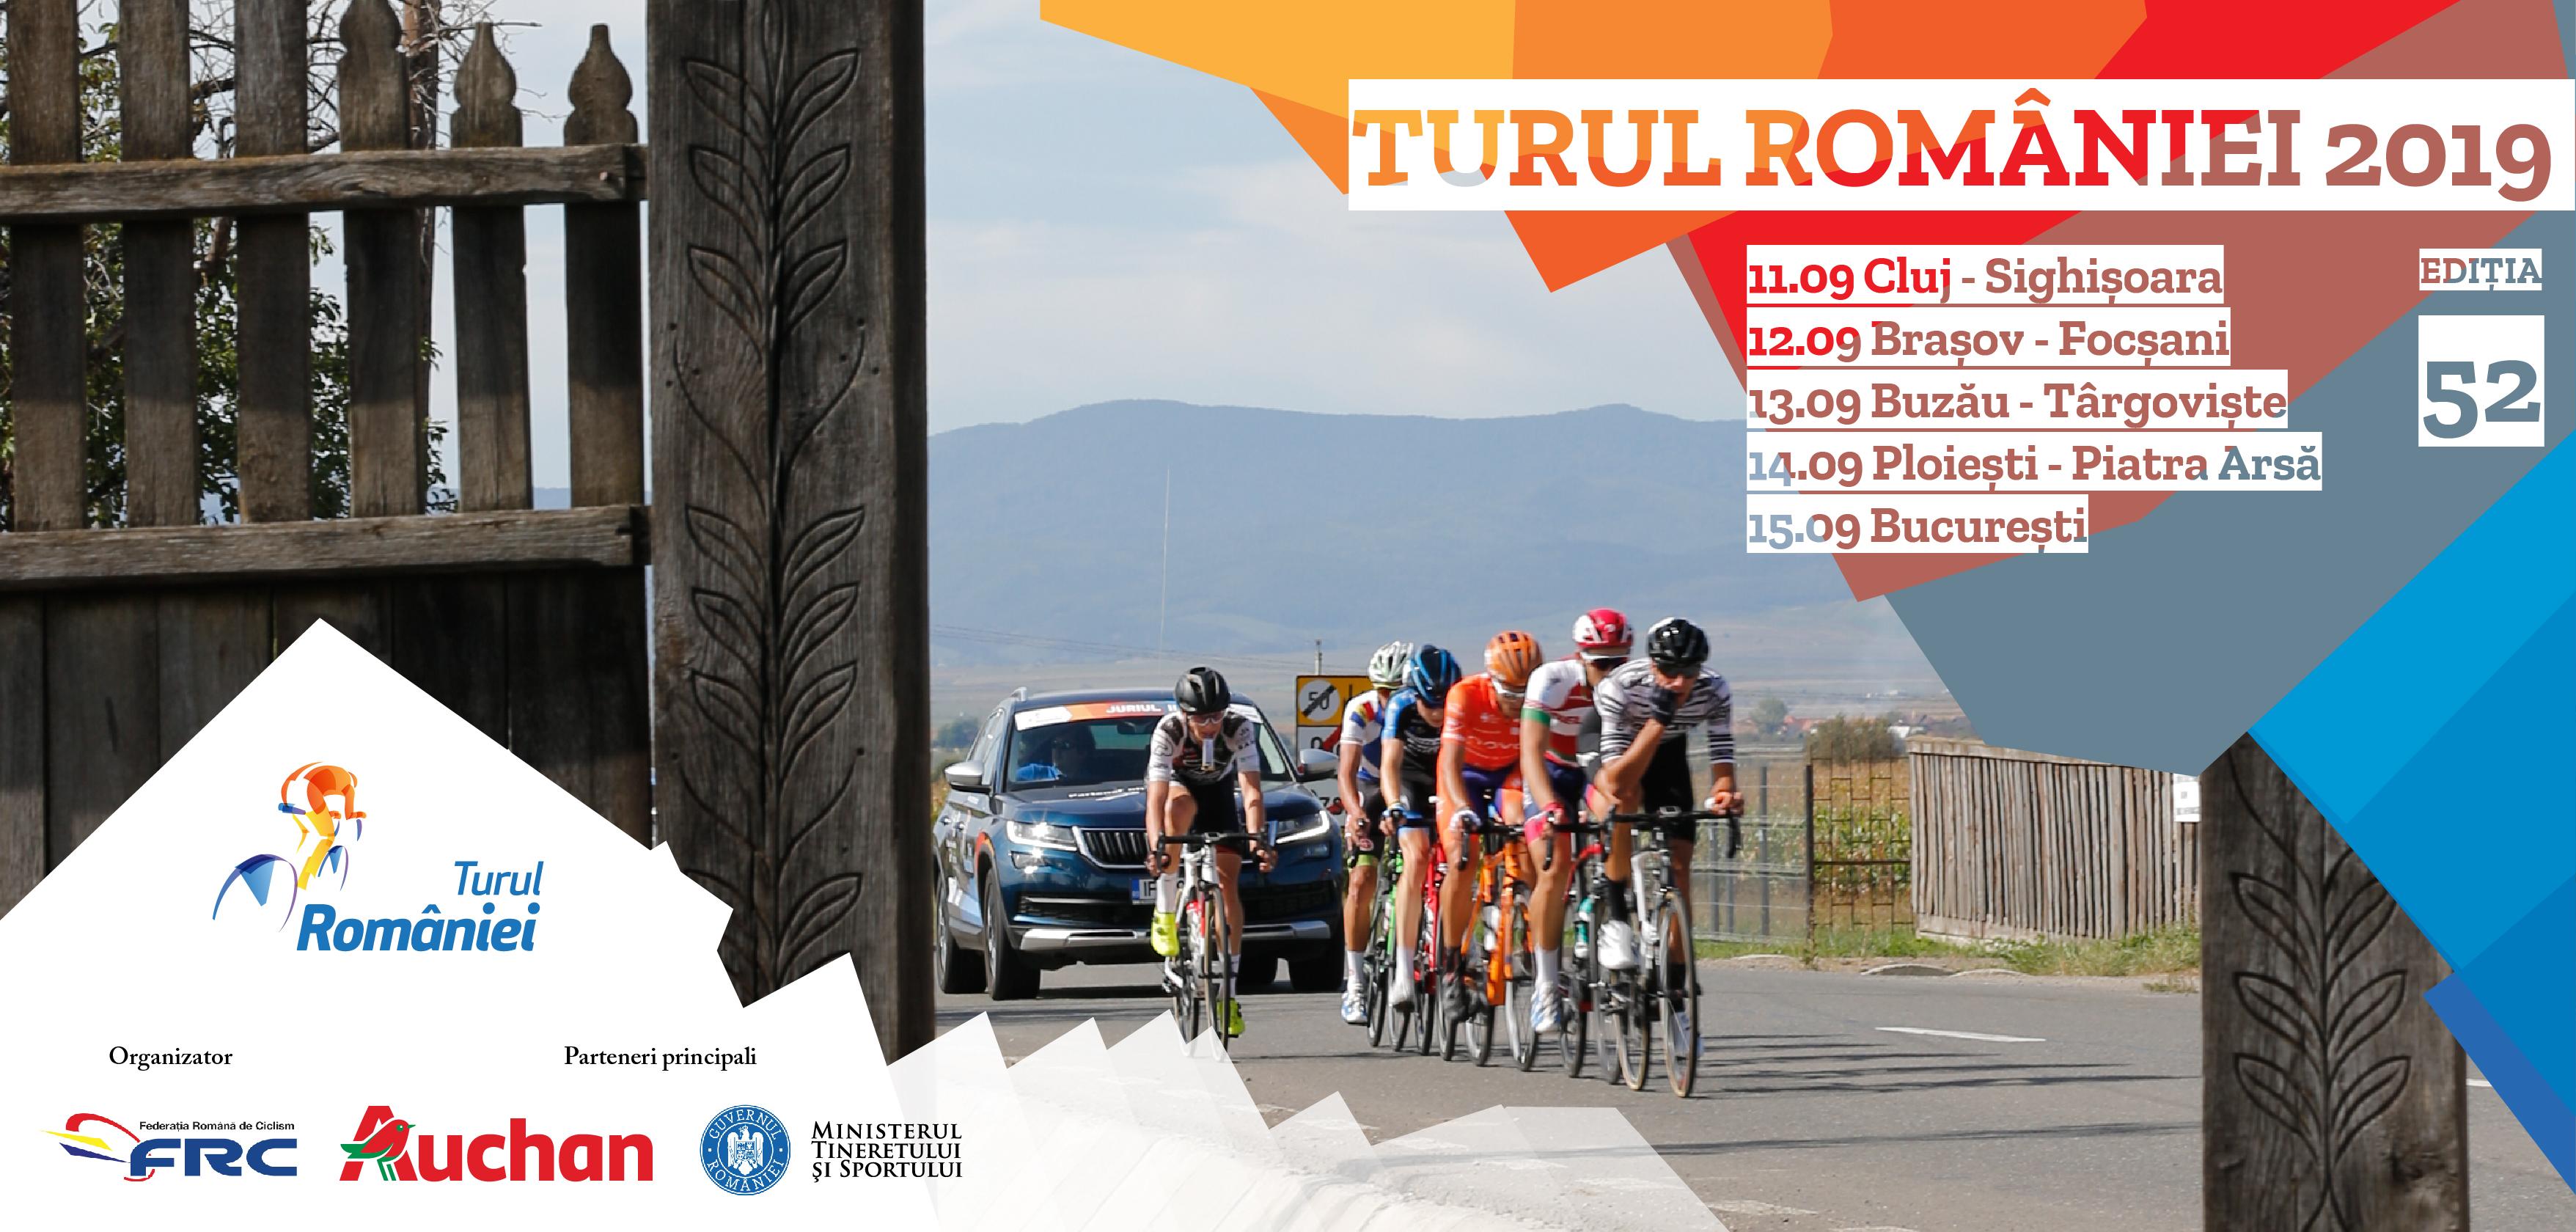 Turul României 2019, prima competiție pe TransBucegi